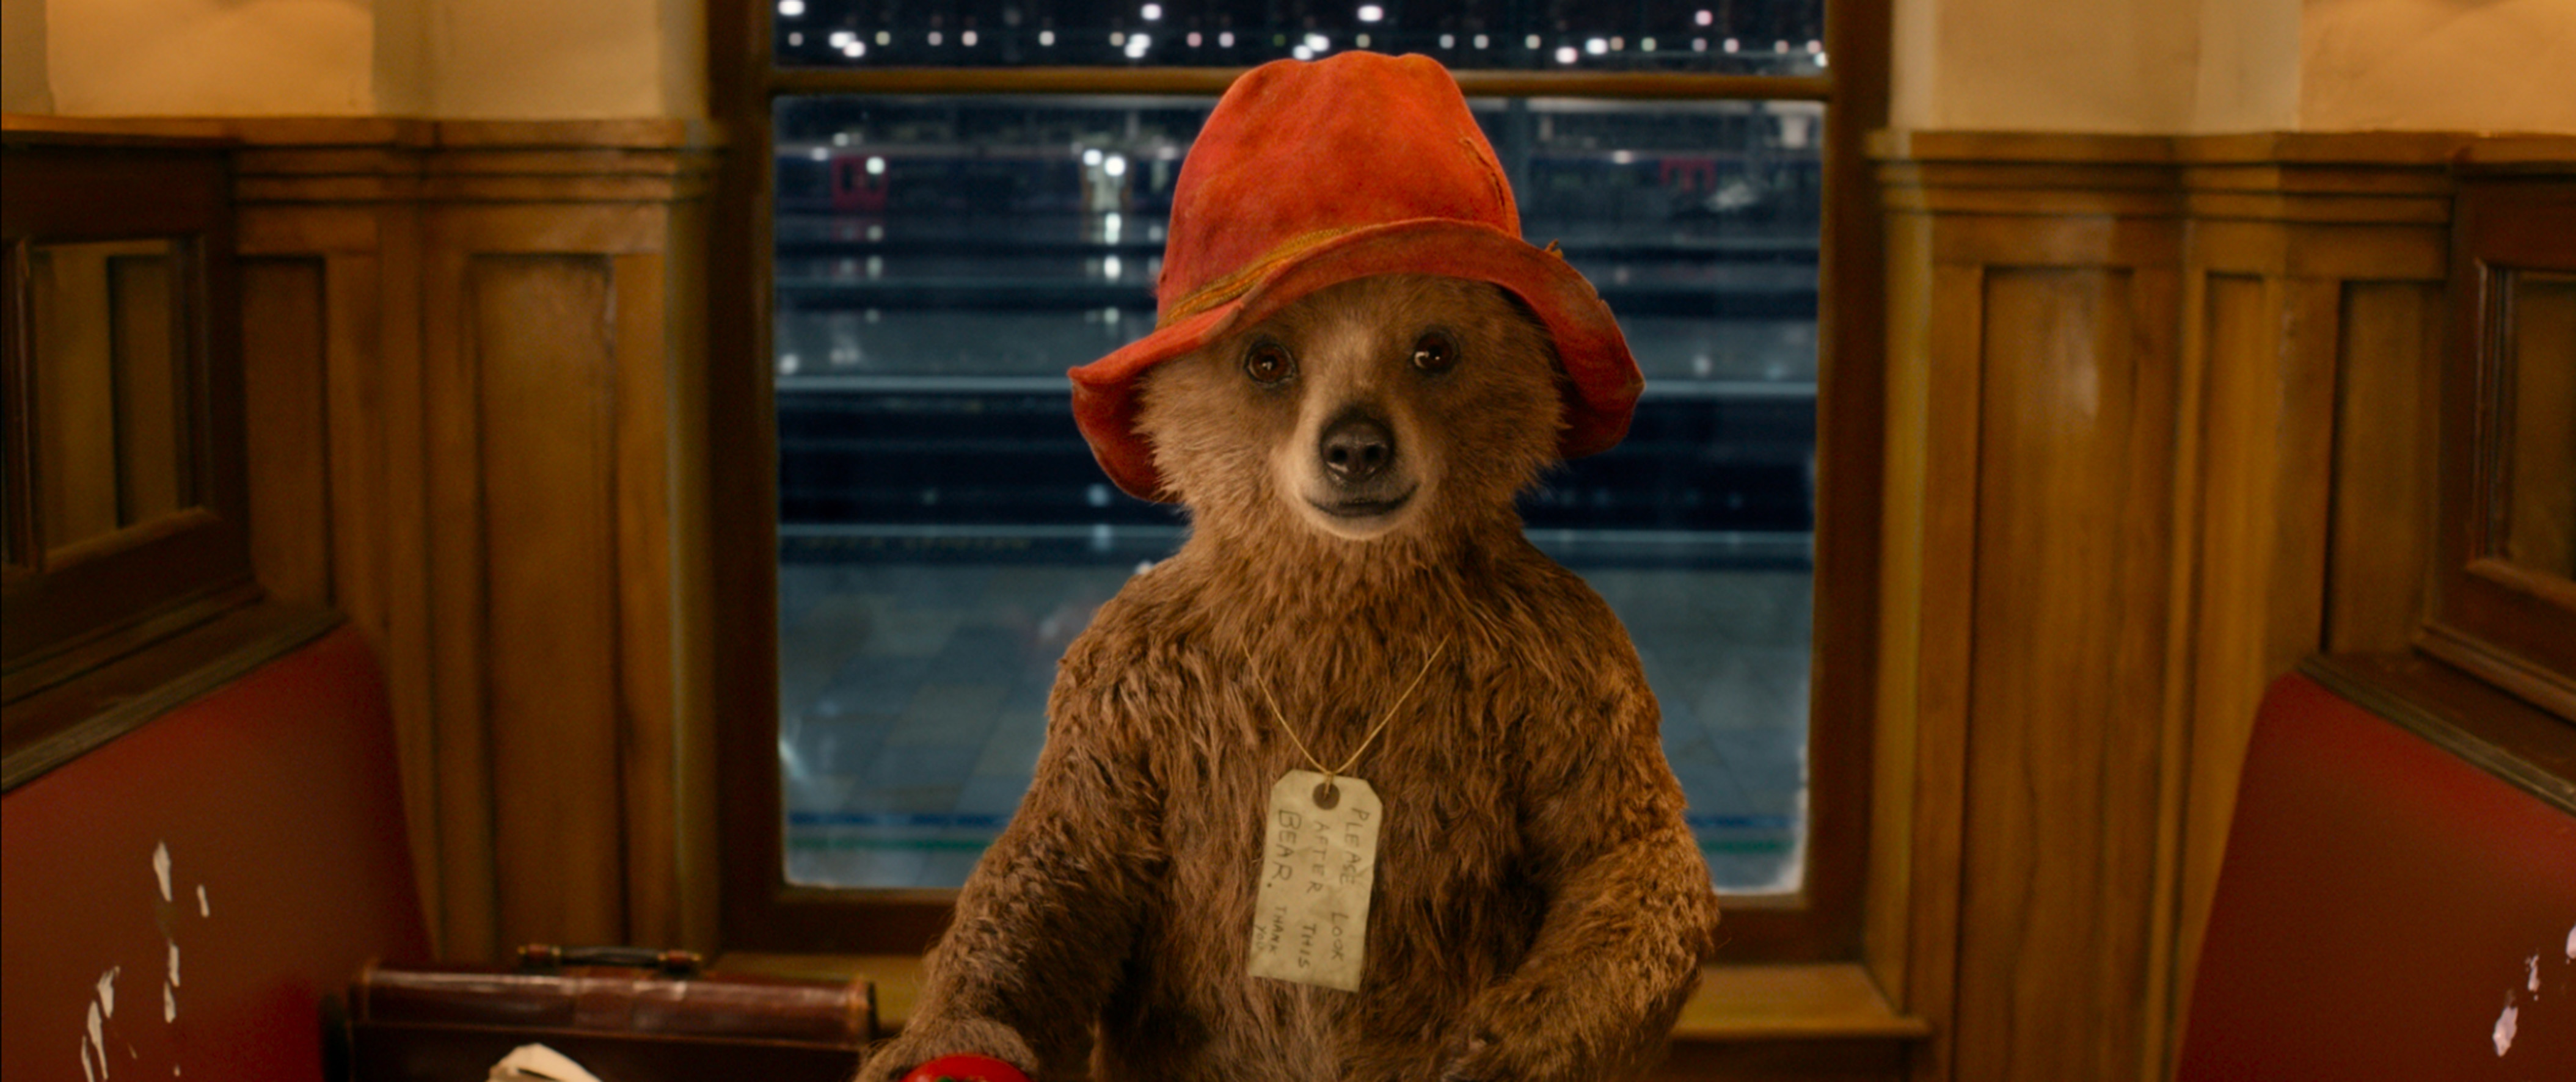 (C)2014 STUDIOCANAL S.A. TF1 FILMS PRODUCTION S.A.S Paddington Bear™, Paddington™ AND PB™ are trademarks of Paddington and Company Limited